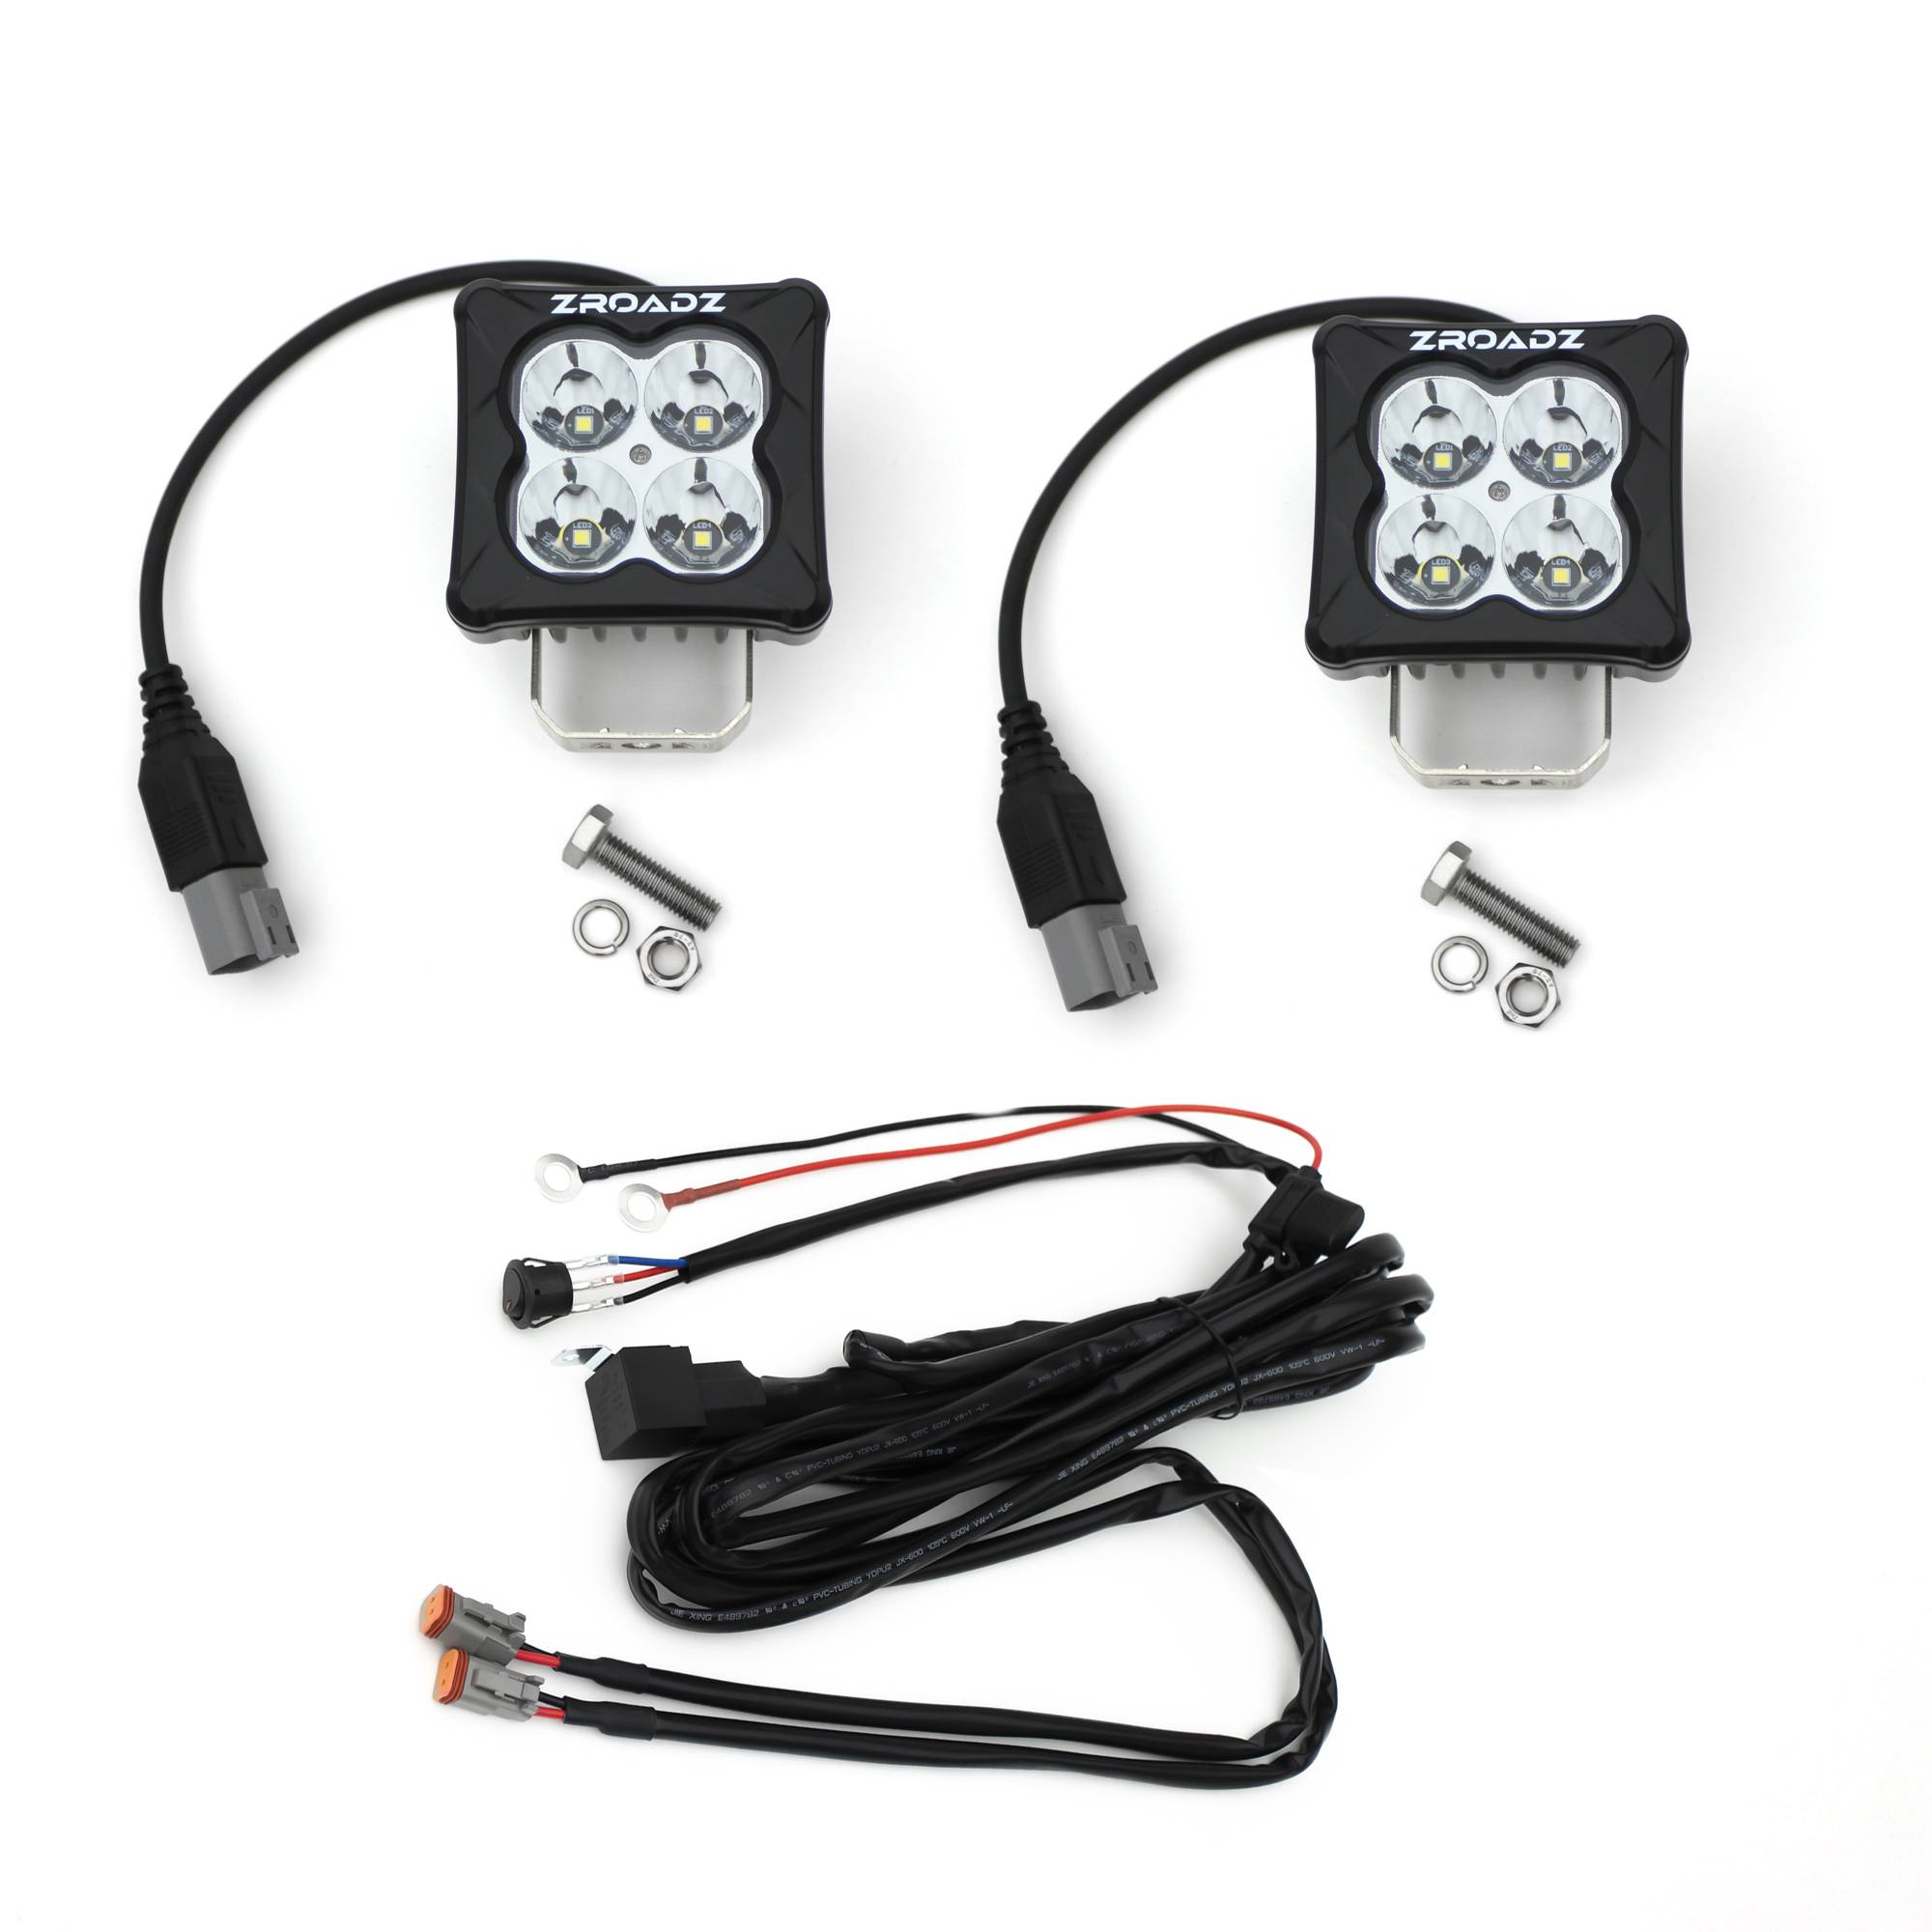 ZROADZ OFF ROAD PRODUCTS - 3 inch ZROADZ LED Light Pod Kit, G2 Series, Bright White, Spot Beam, 2 Piece With Wiring Harness - PN #Z30BC20W-D3S-K